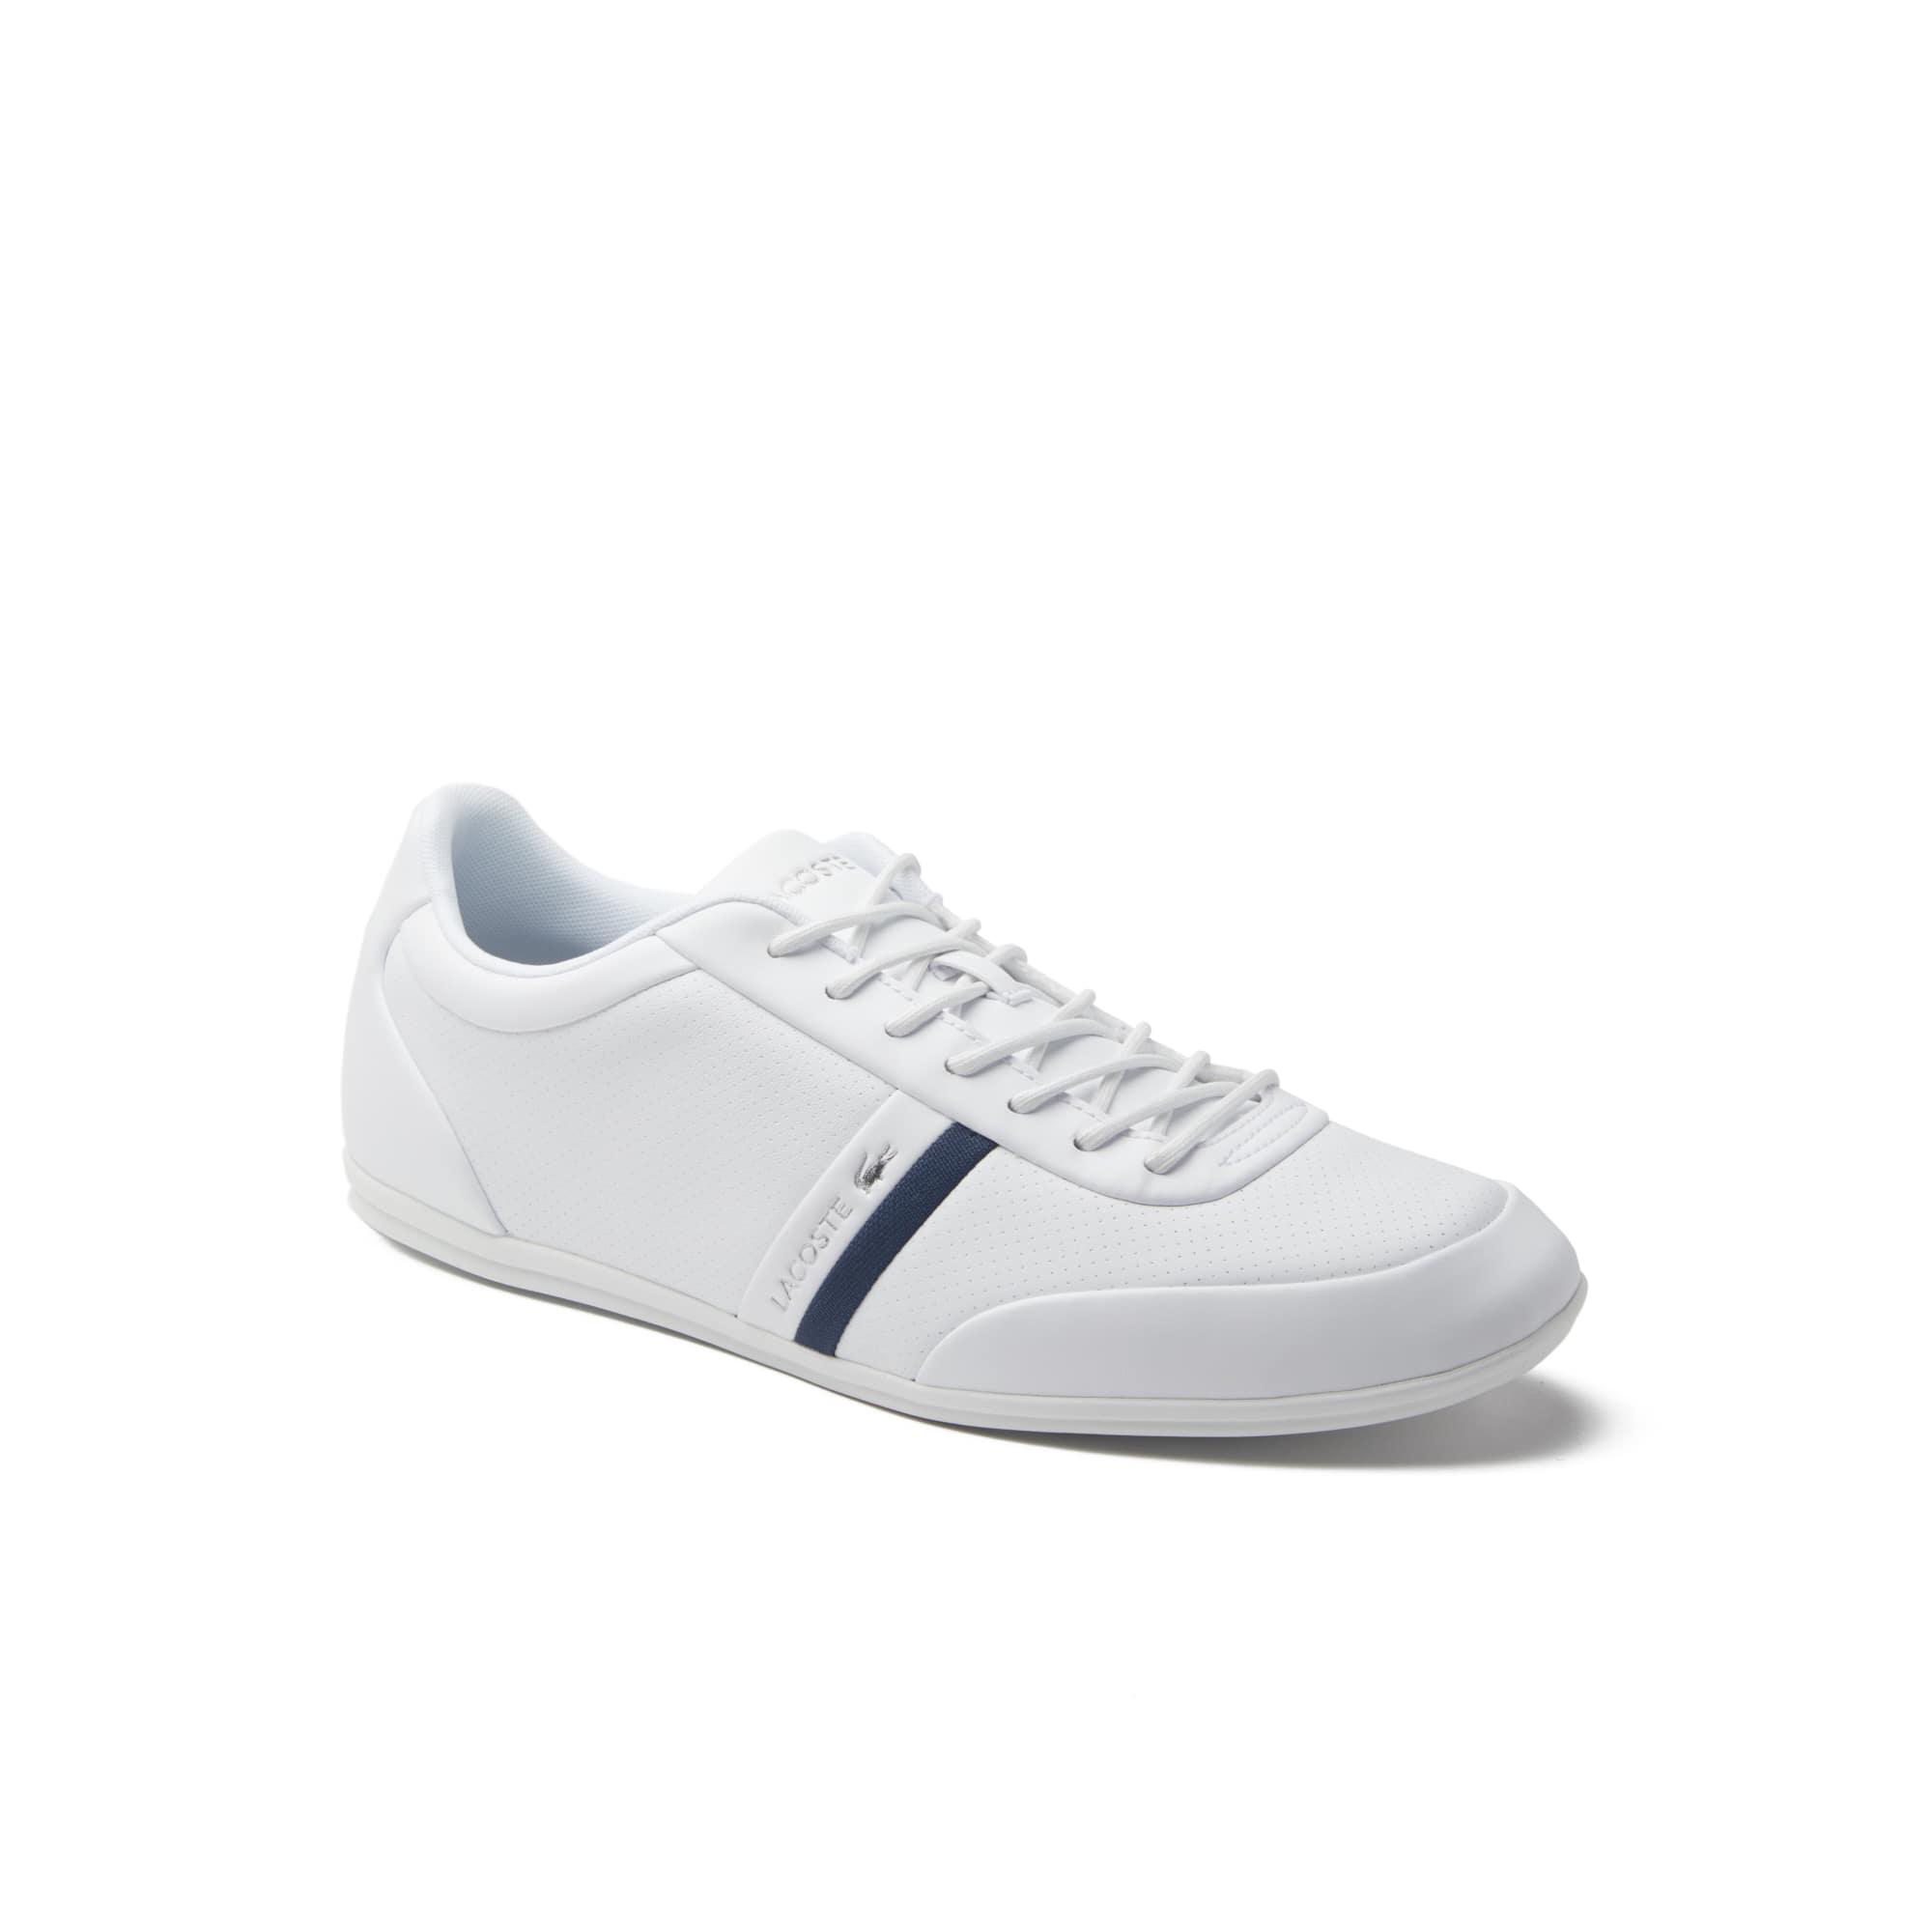 b9f1b93ba975 Men s Storda Sneaker